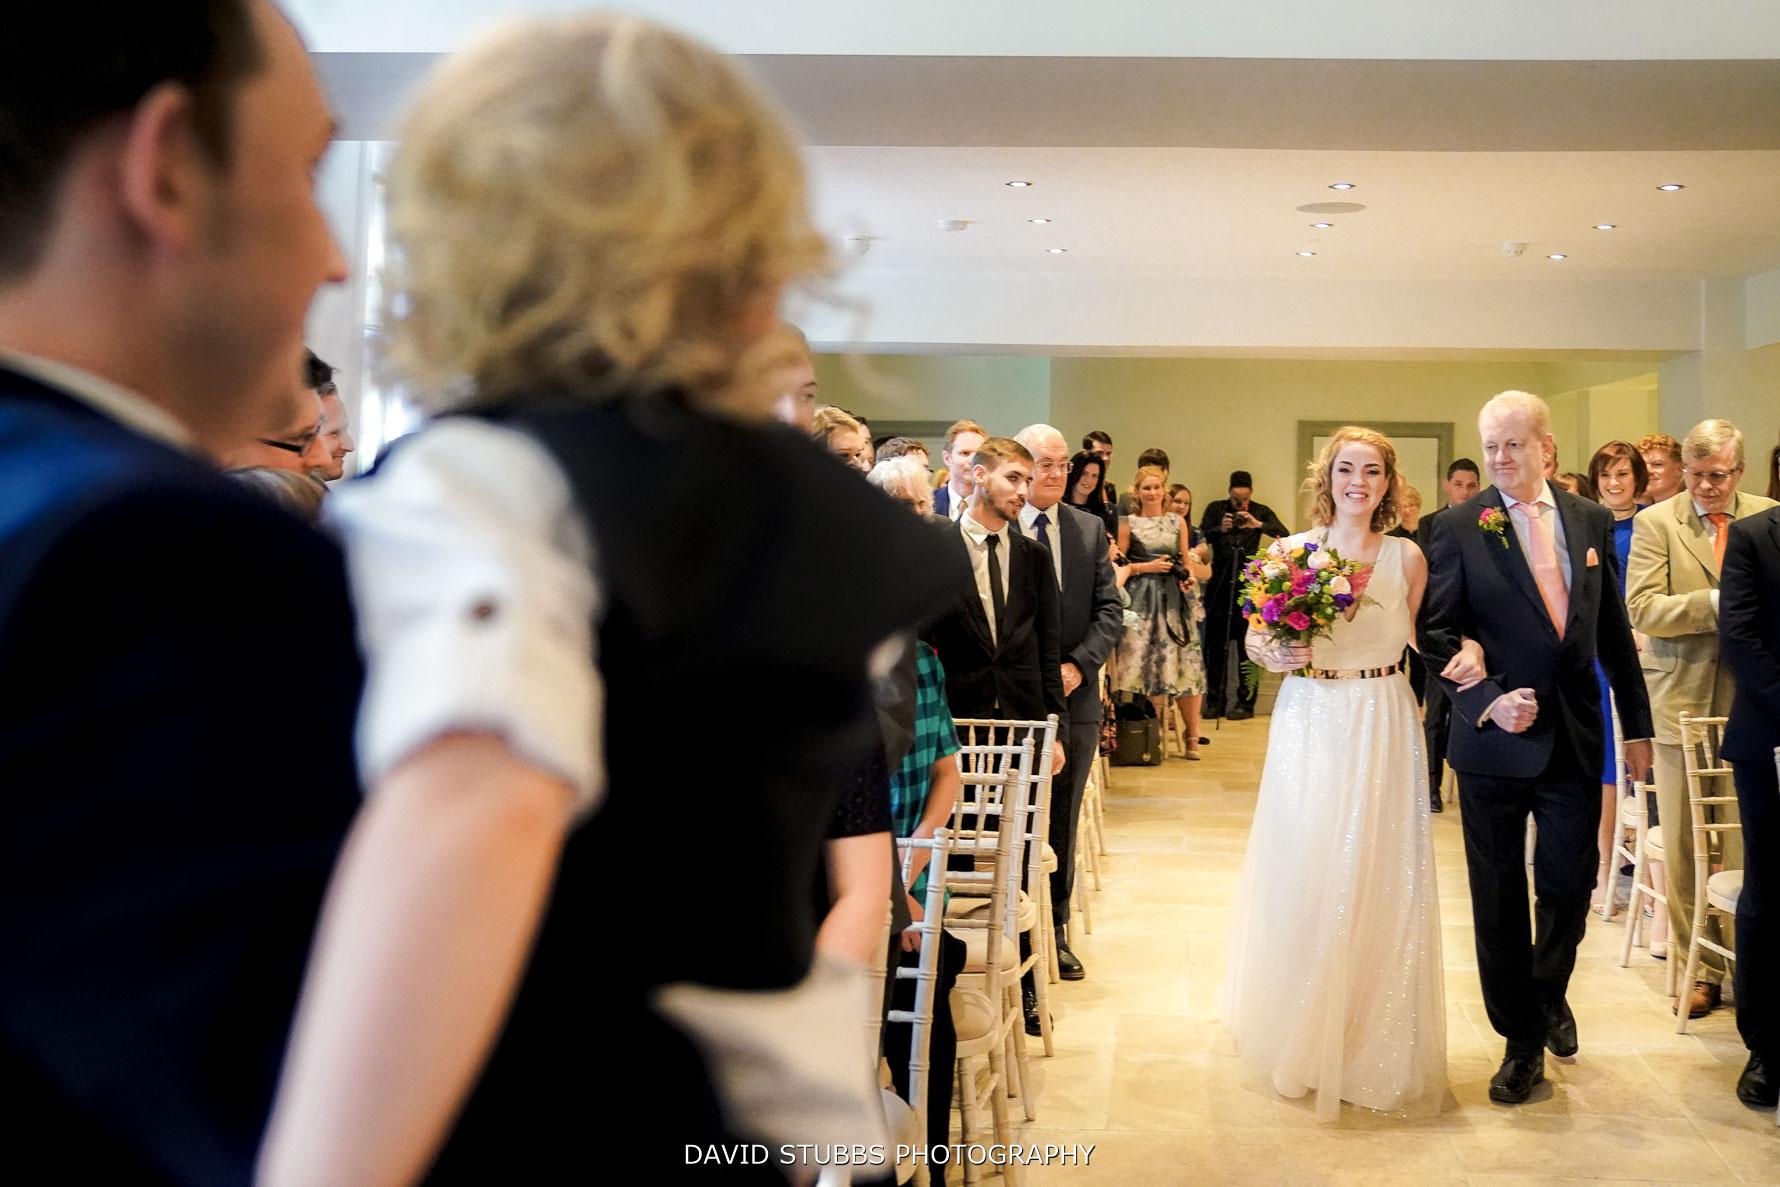 walking down the isle for their wedding ceremony at Tyn Dwr Hall